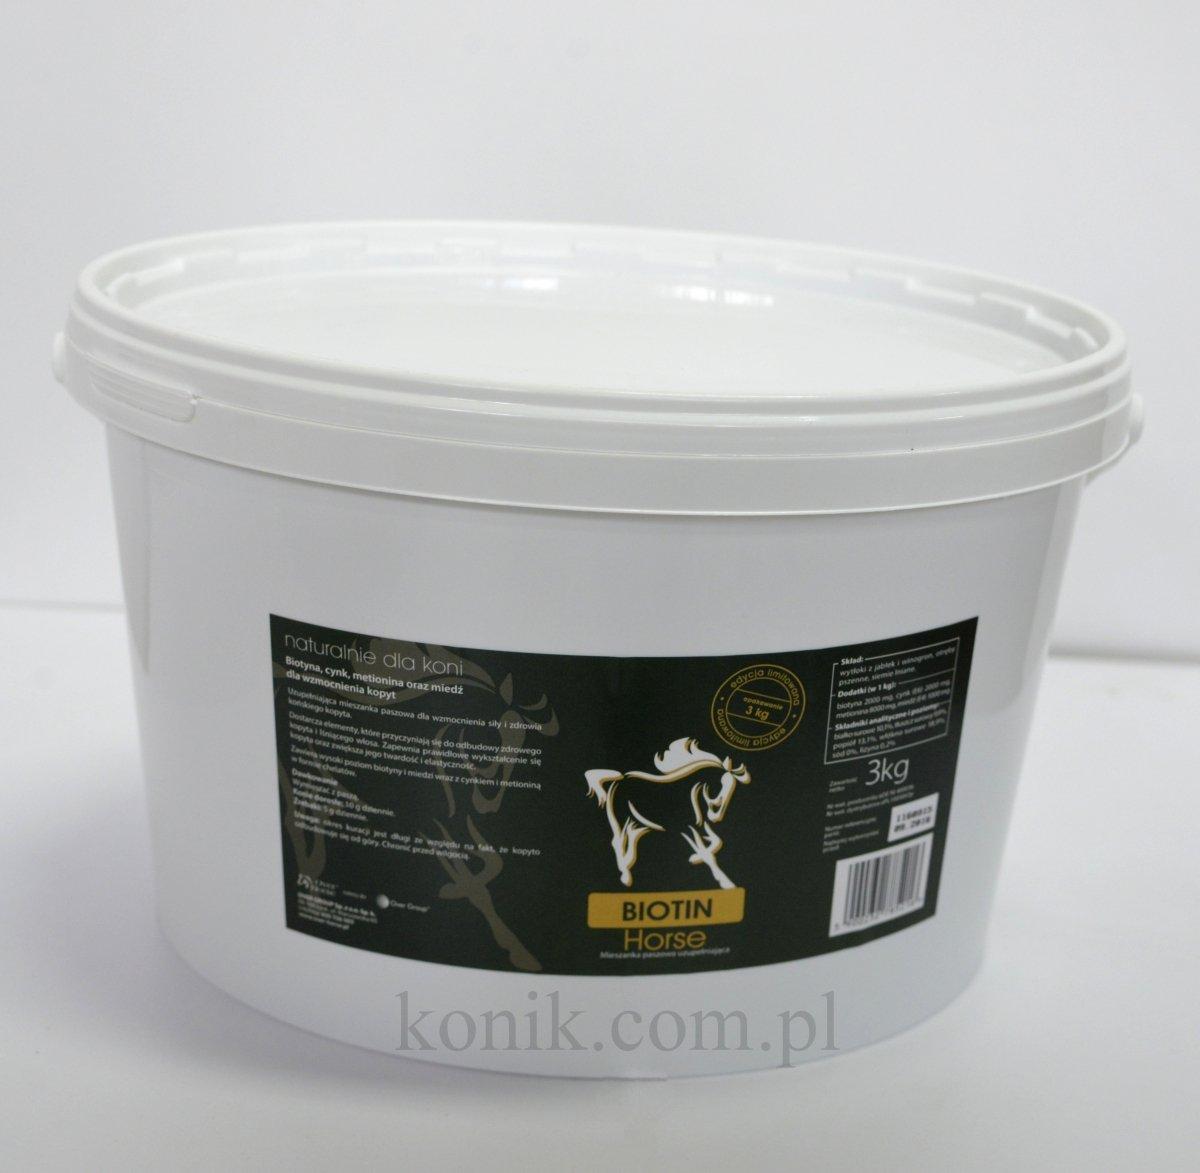 Biotyna BIOTIN HORSE 3kg - OVER HORSE (edycja limitowana)